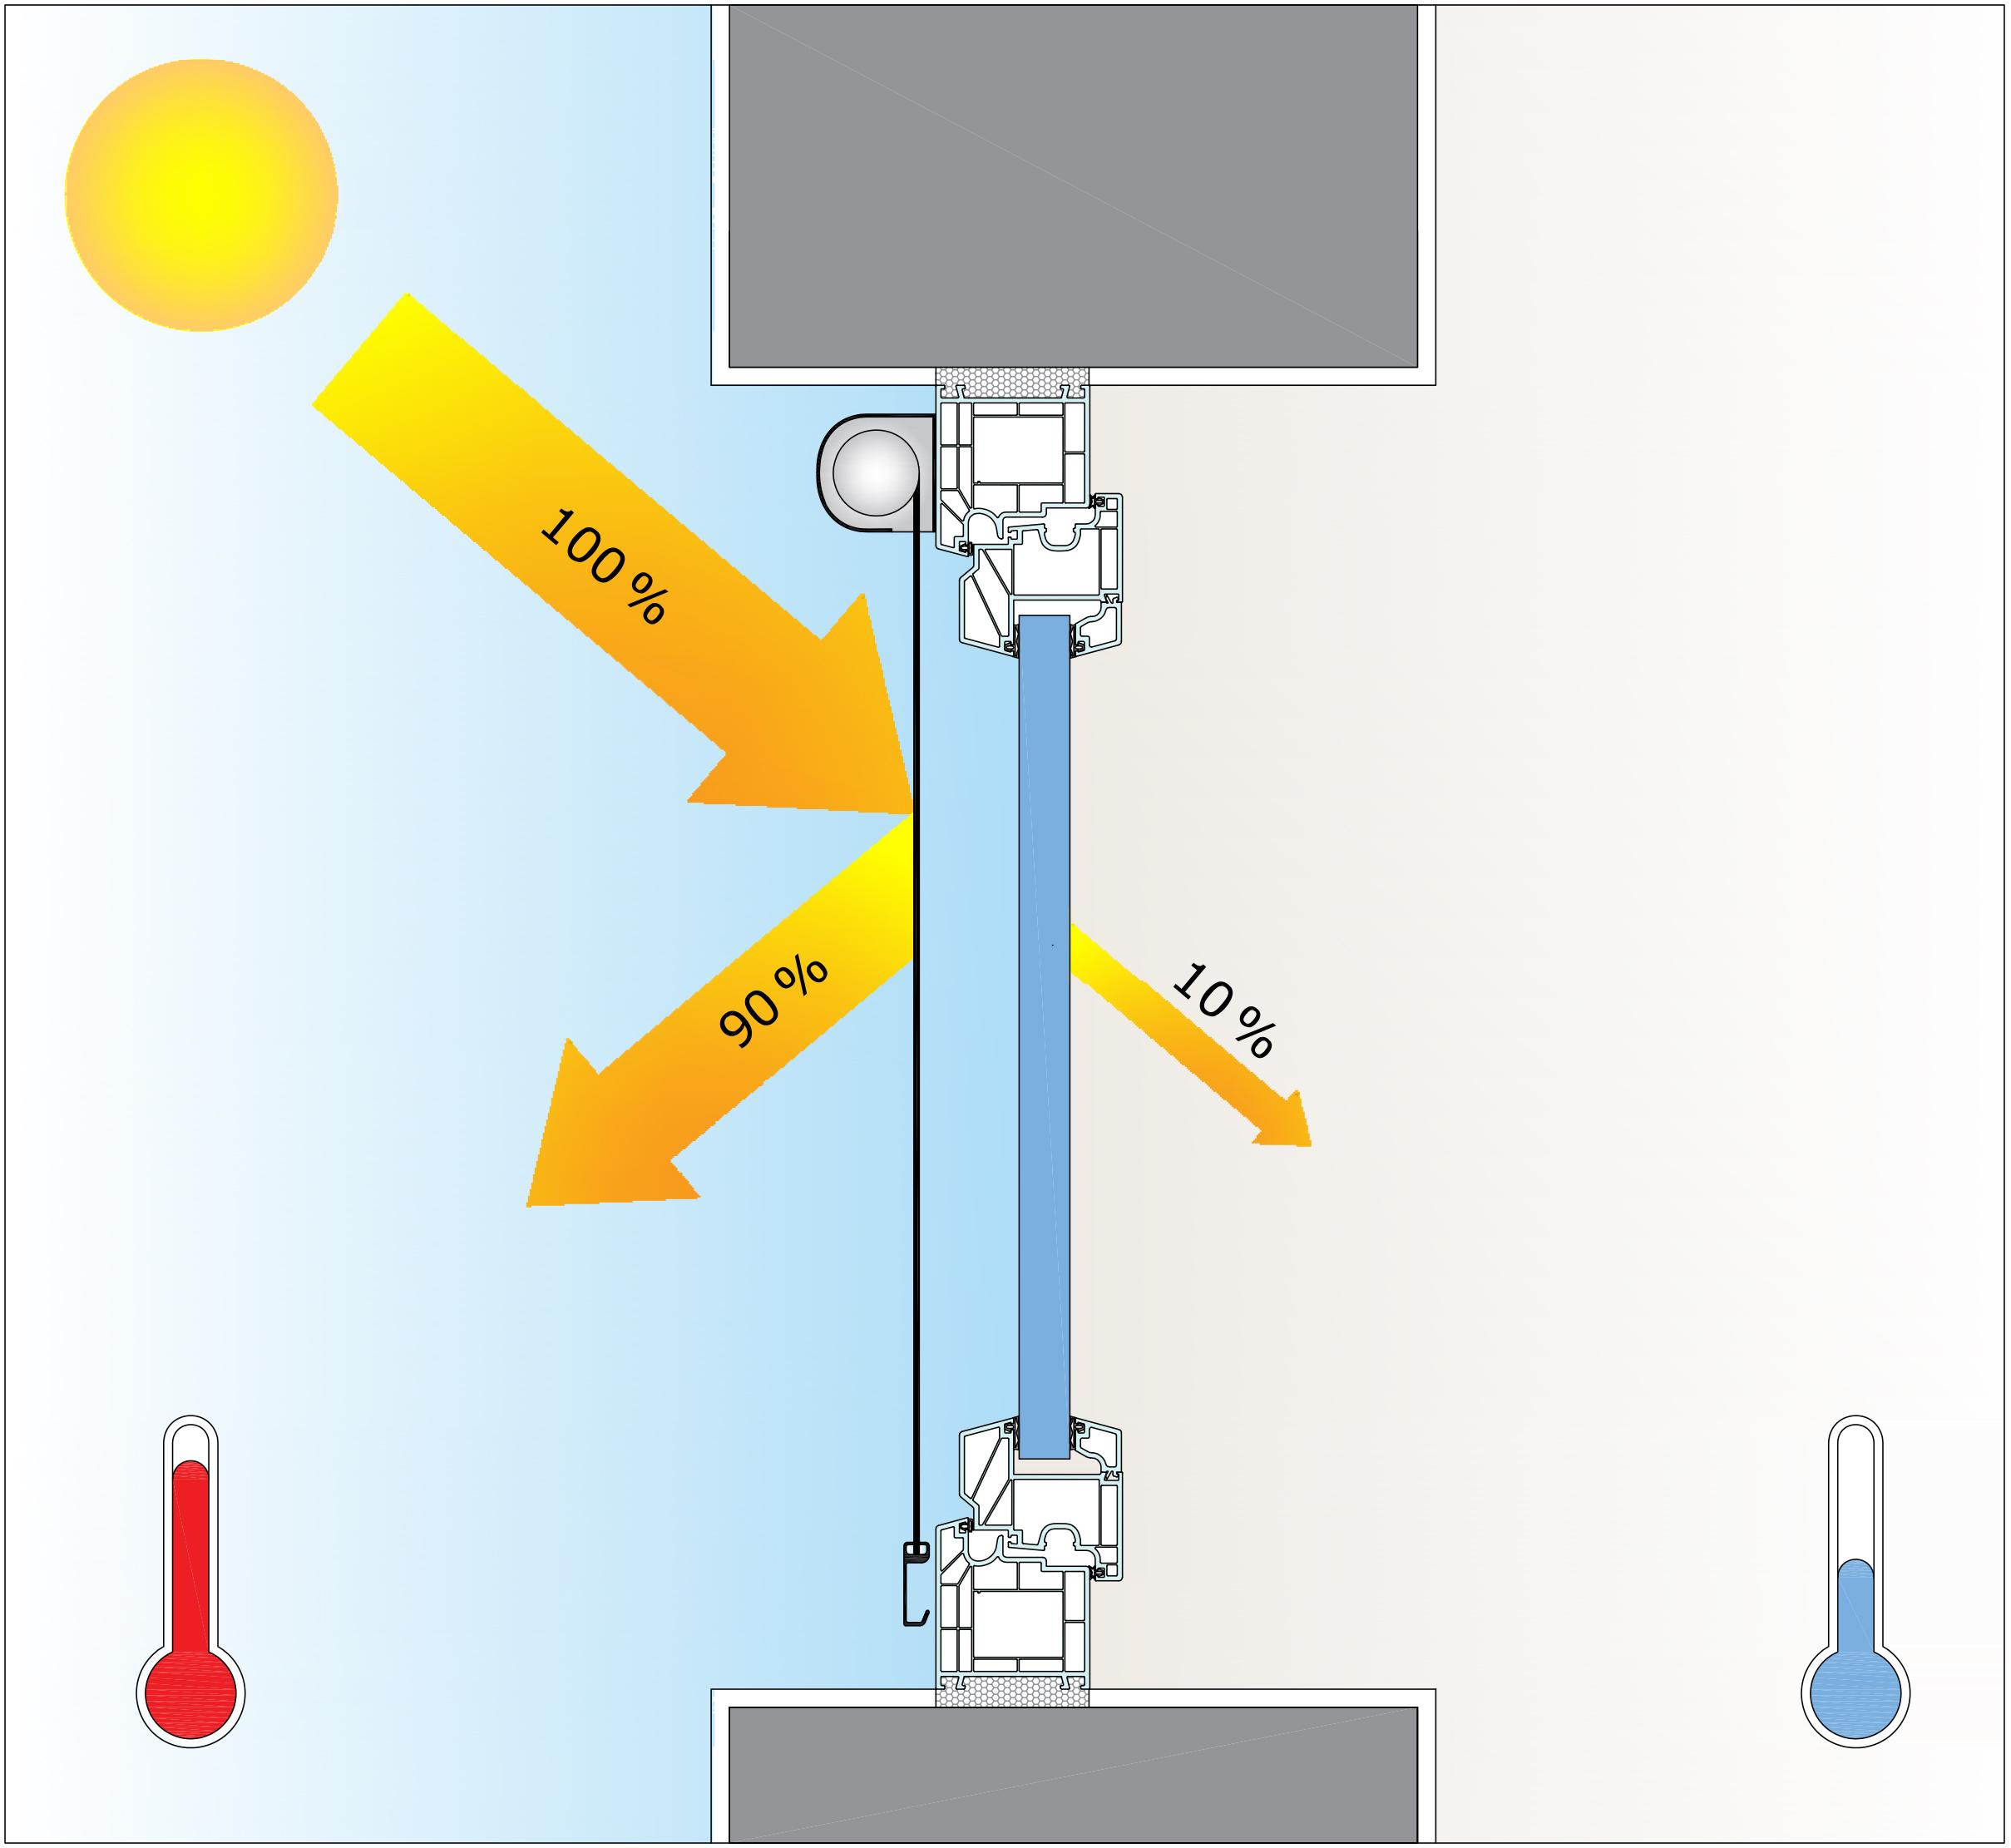 T:\TFE\CAD\0_Zwischenablge\Gerl\08_Blinos\041124_Blinos_Grafik Model (1)